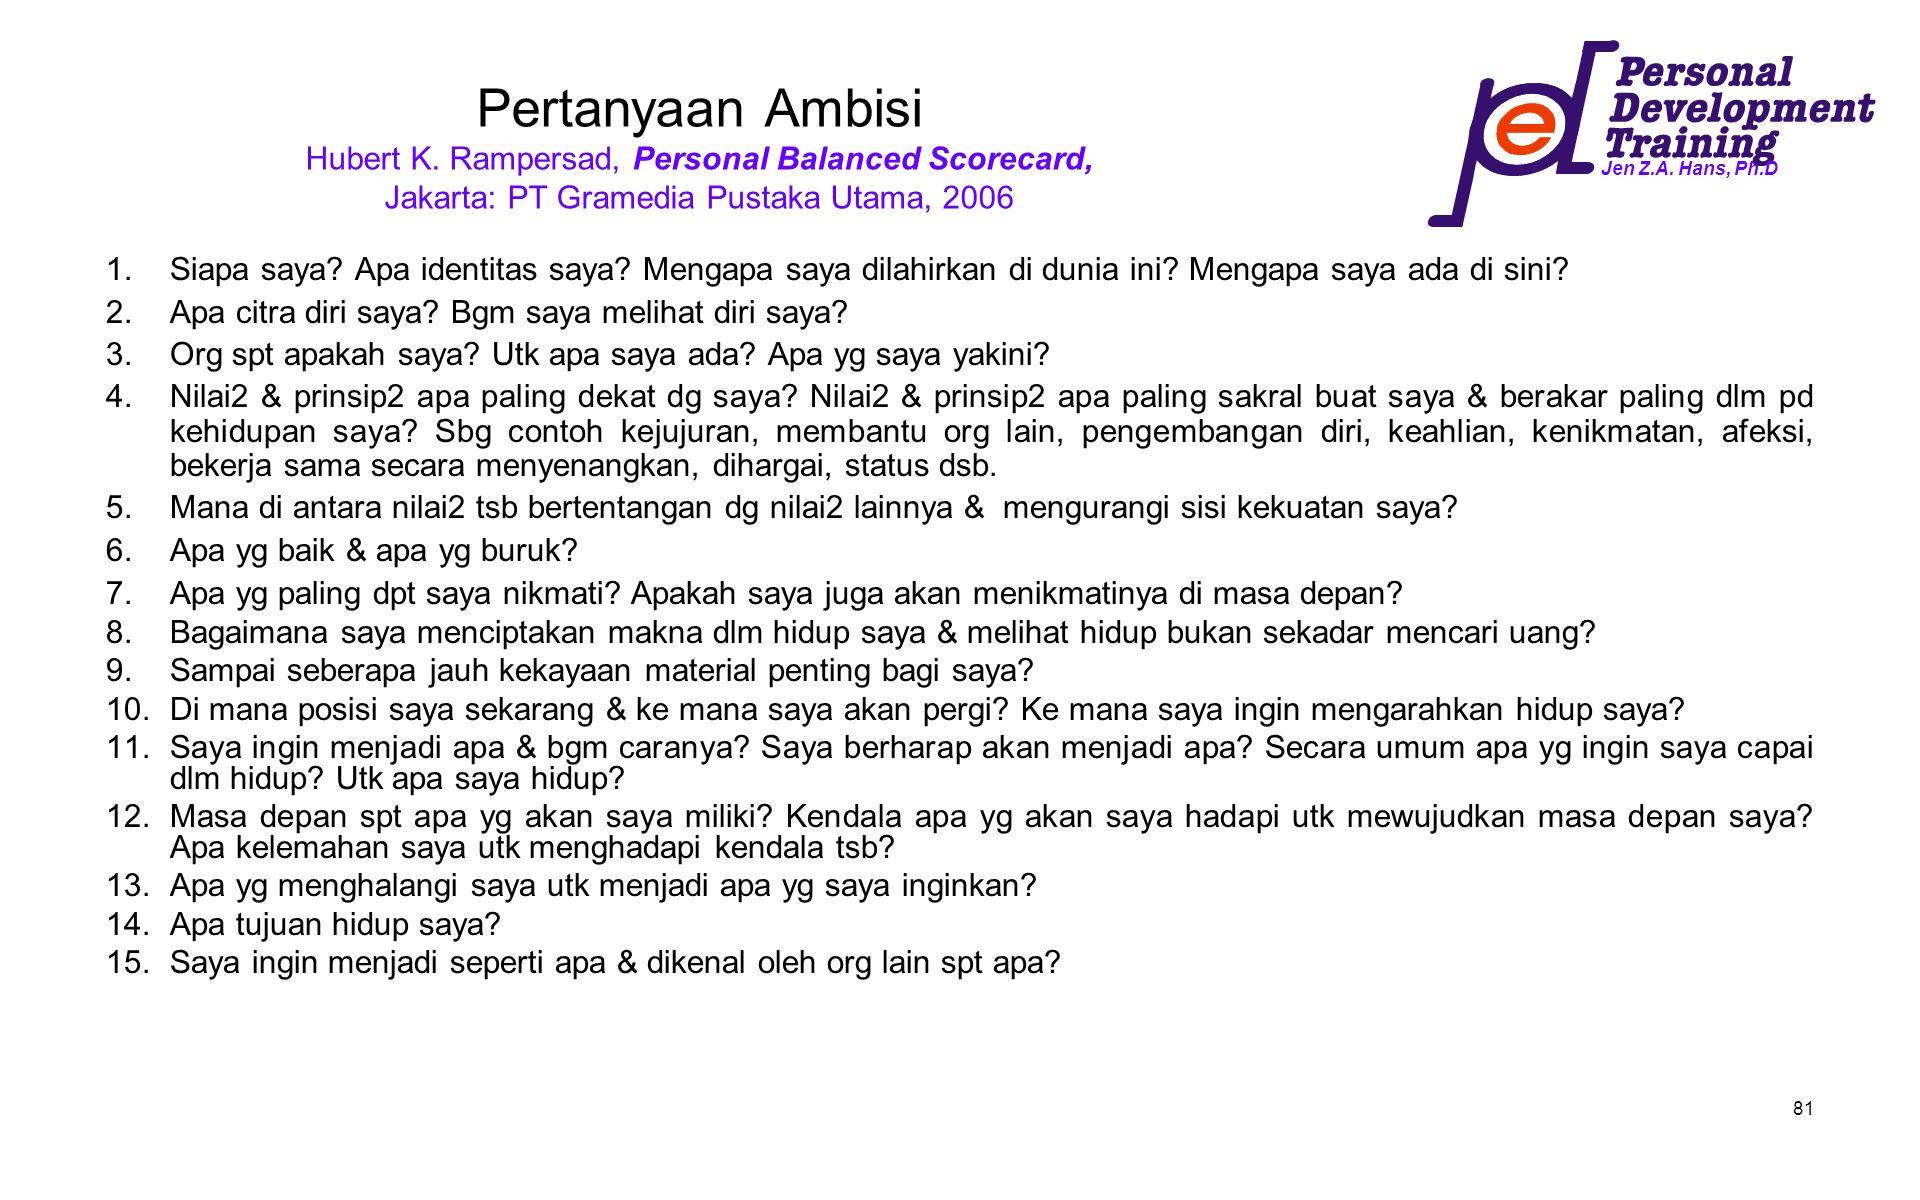 Pertanyaan Ambisi Hubert K